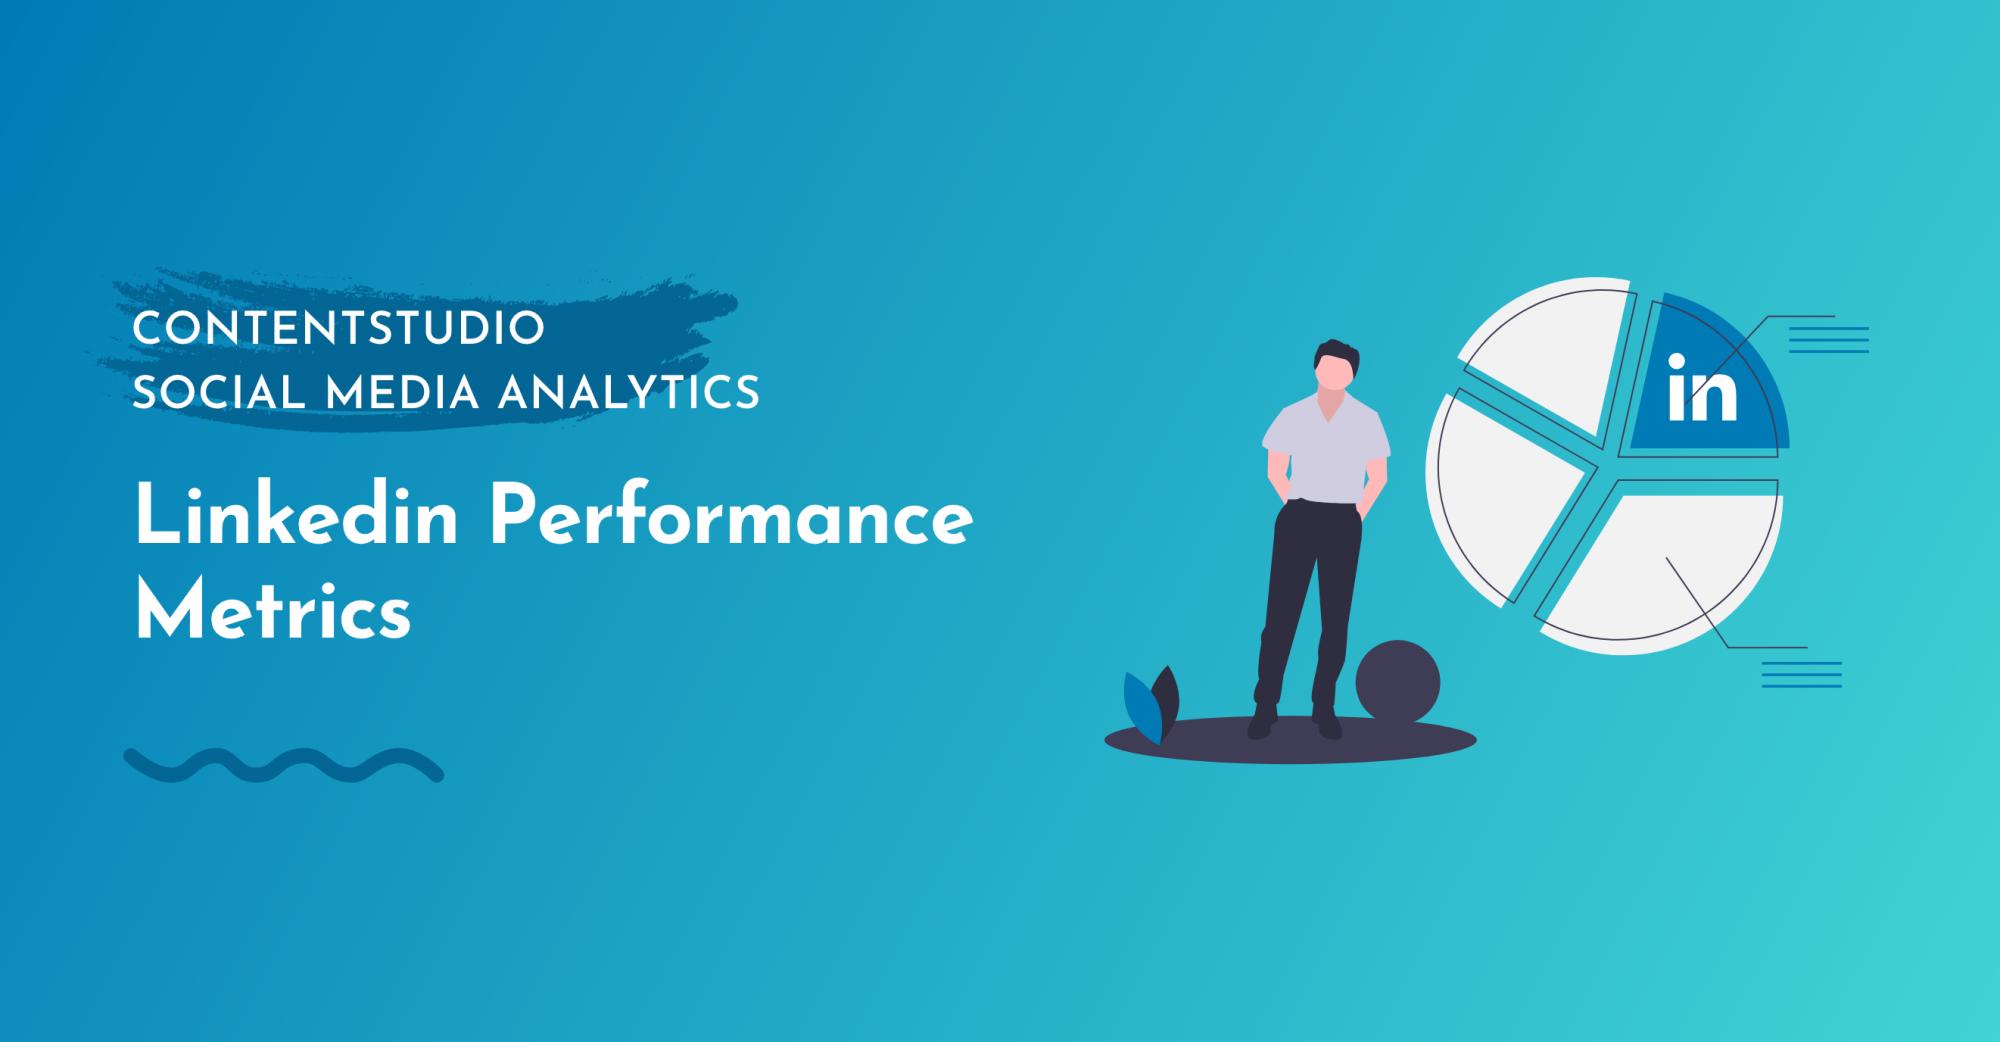 LinkedIn Performance Metrices